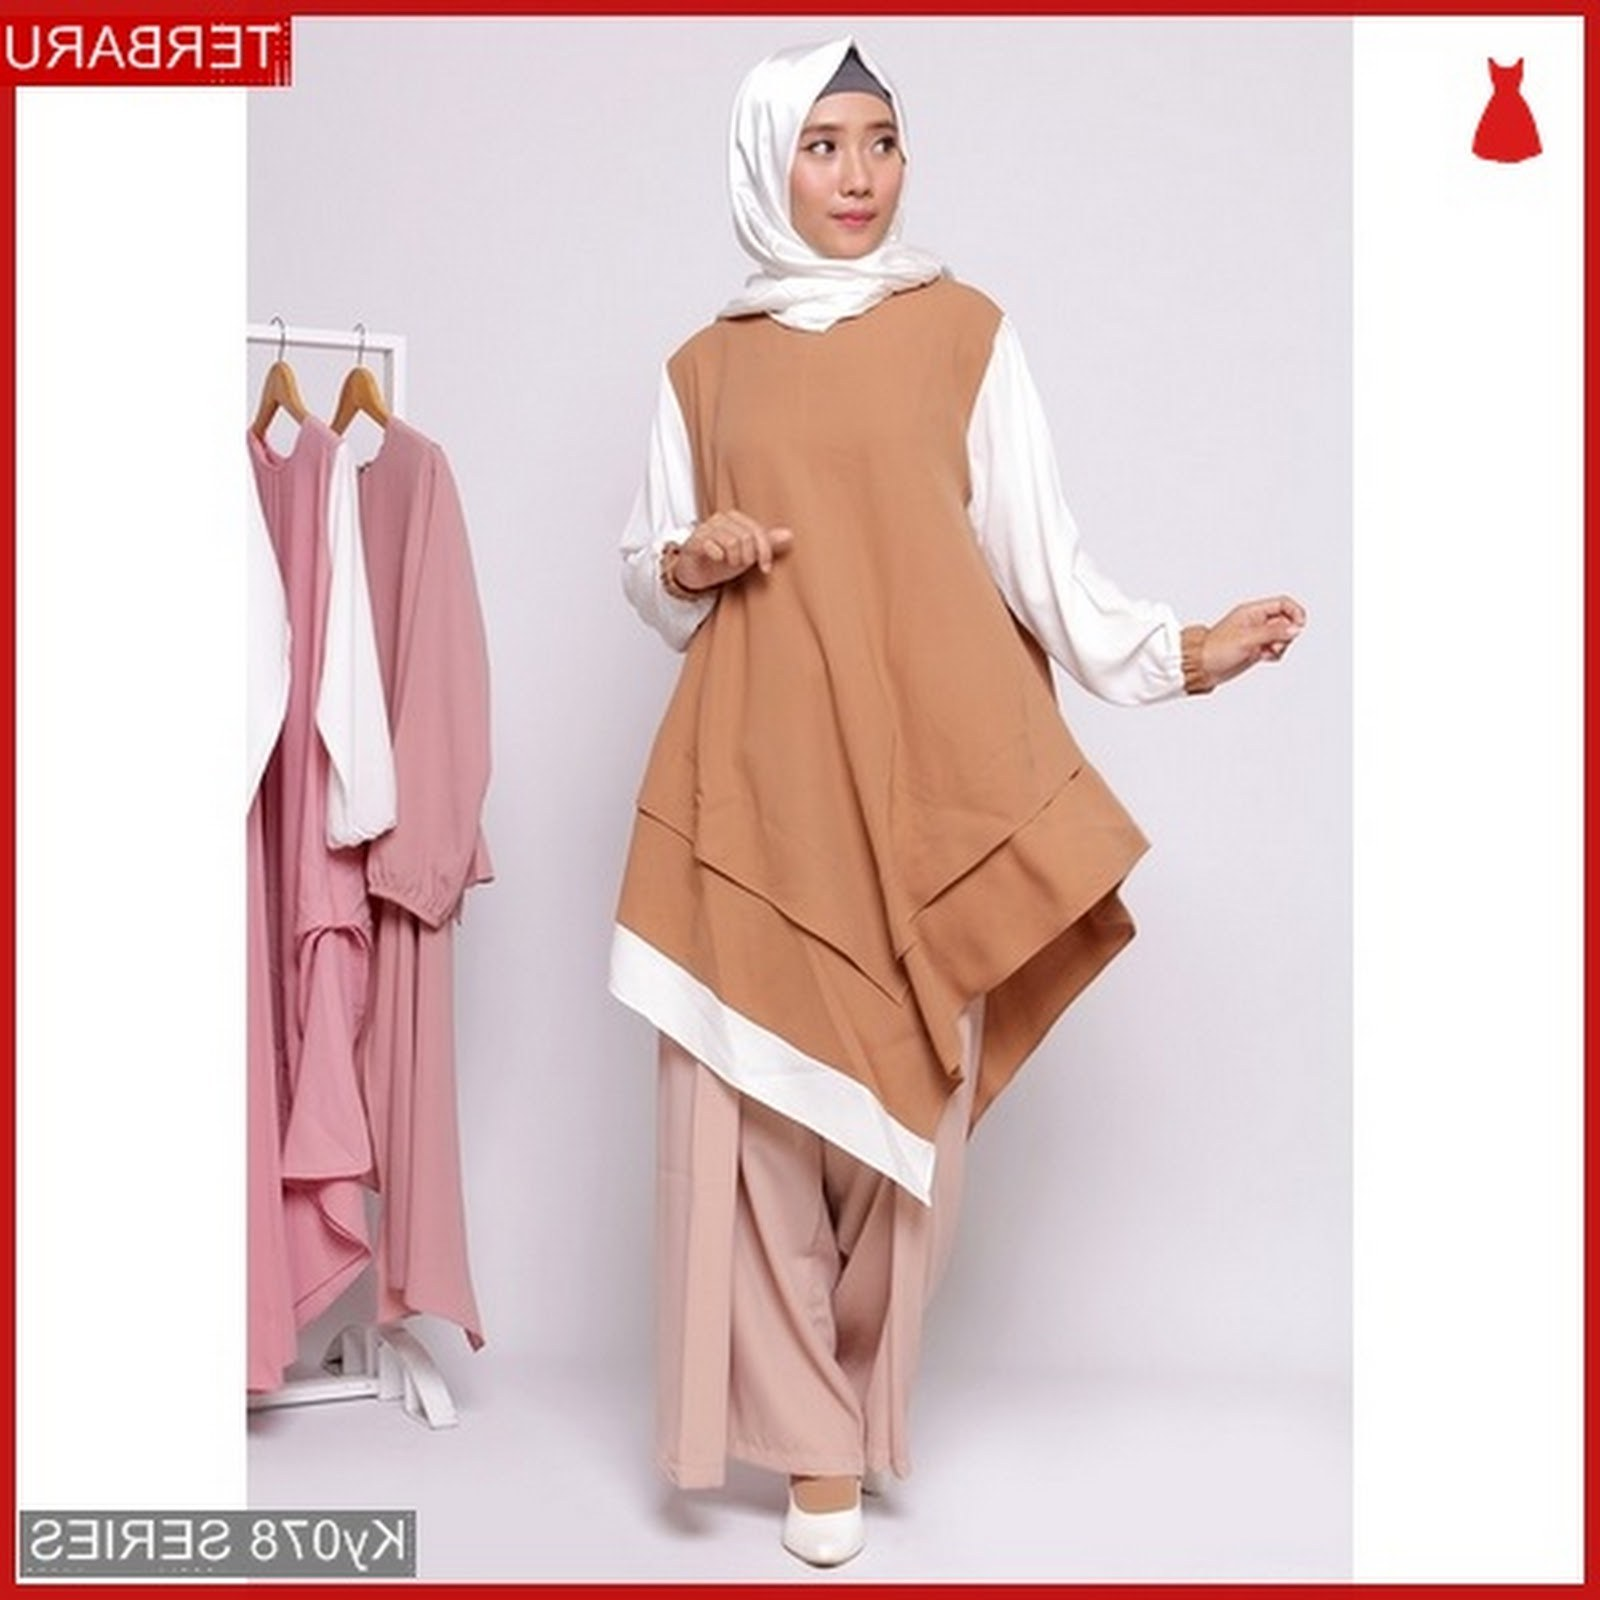 Bentuk Harga Baju Lebaran 0gdr Dapatkan Baju Muslim Lebaran Paling Keren Terbaru Di Bmg